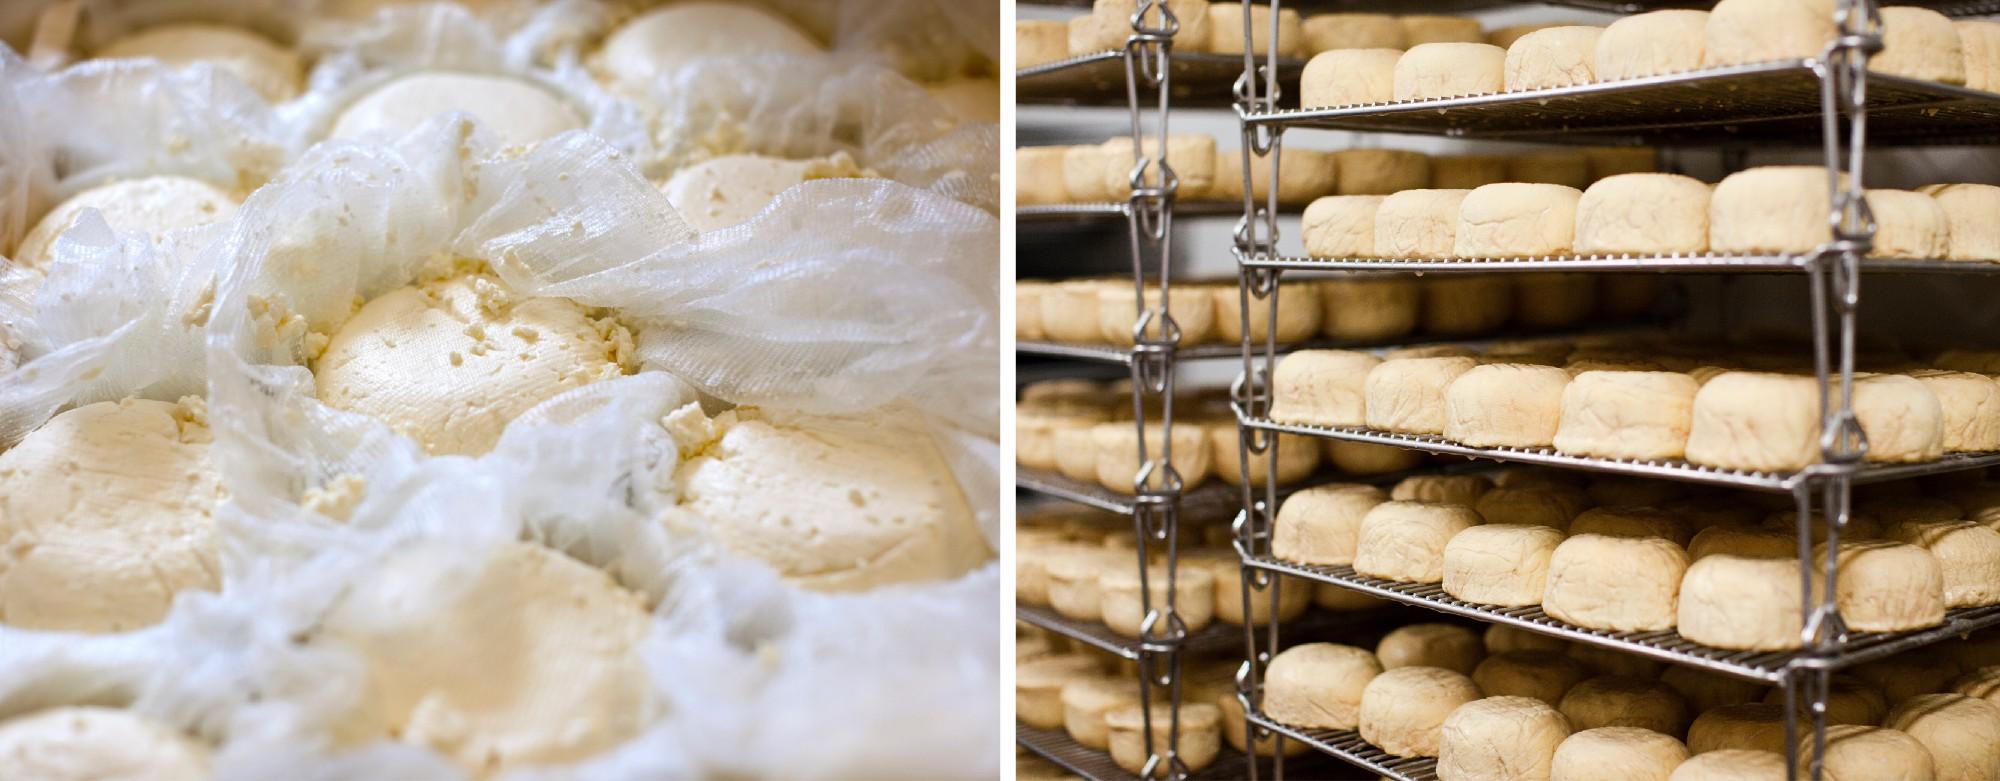 cheese-production-good-eggs.jpeg